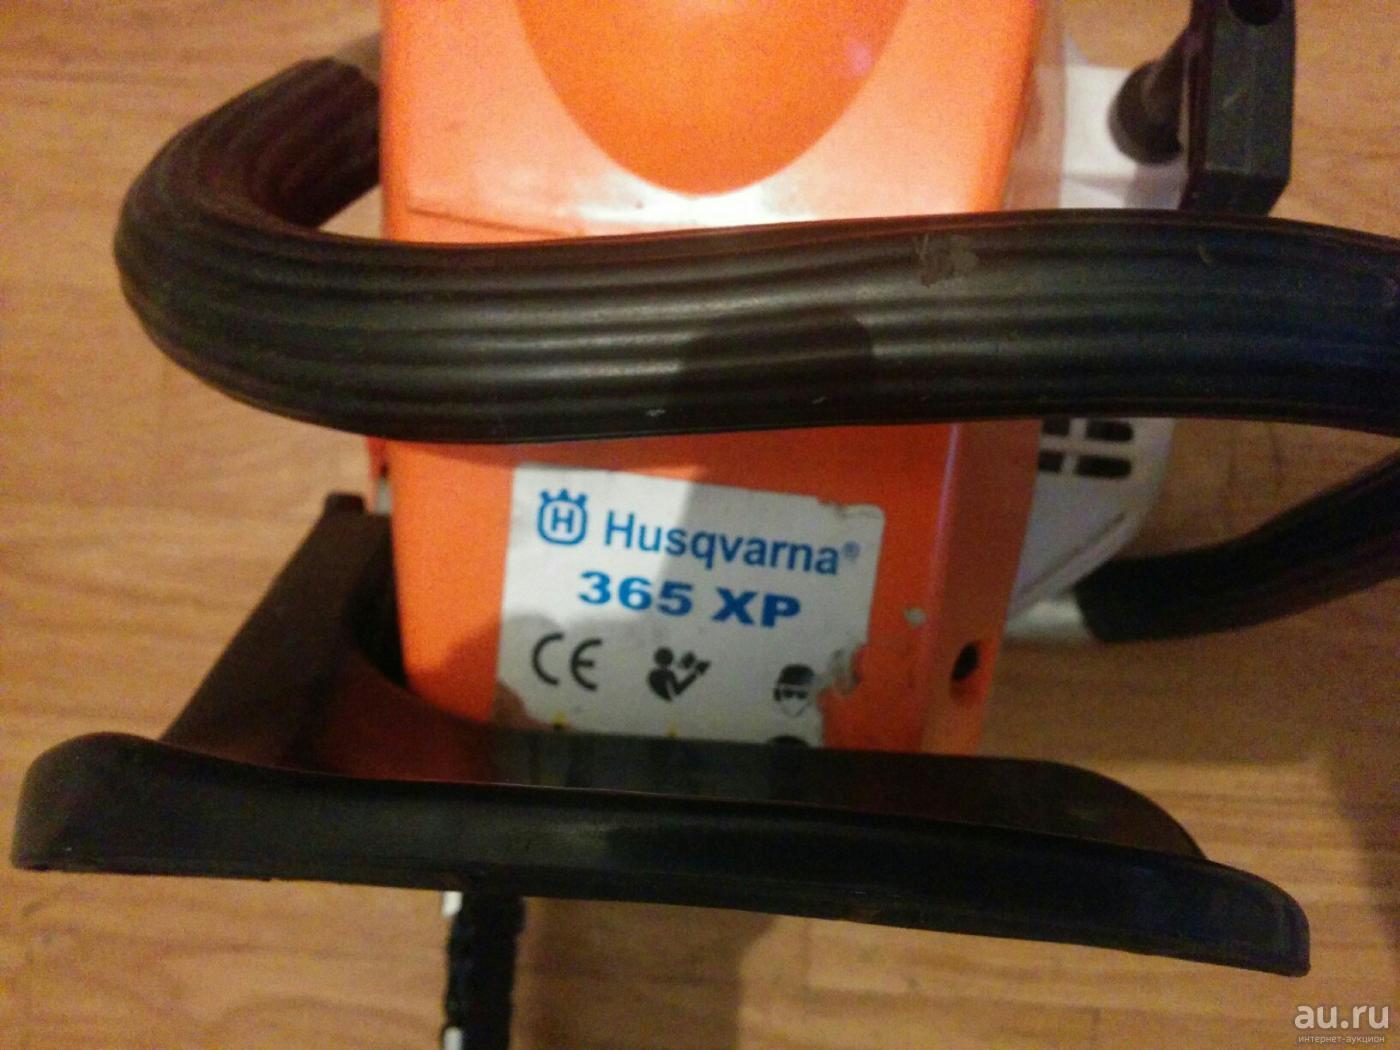 Husqvarna 365 h — «урал» по шведски!